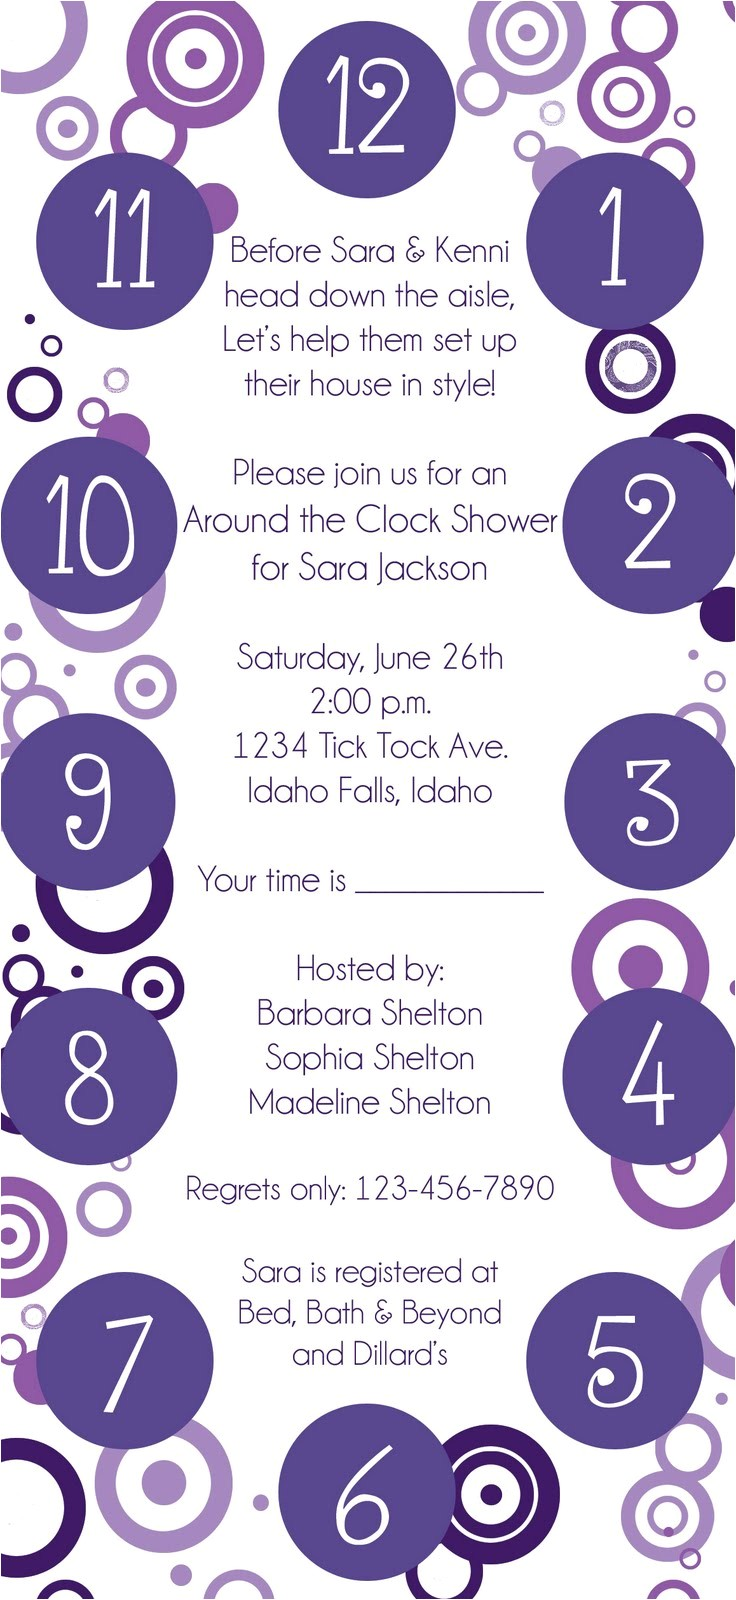 Free Around the Clock Bridal Shower Invitation Templates Around the Clock Shower Invitations Template